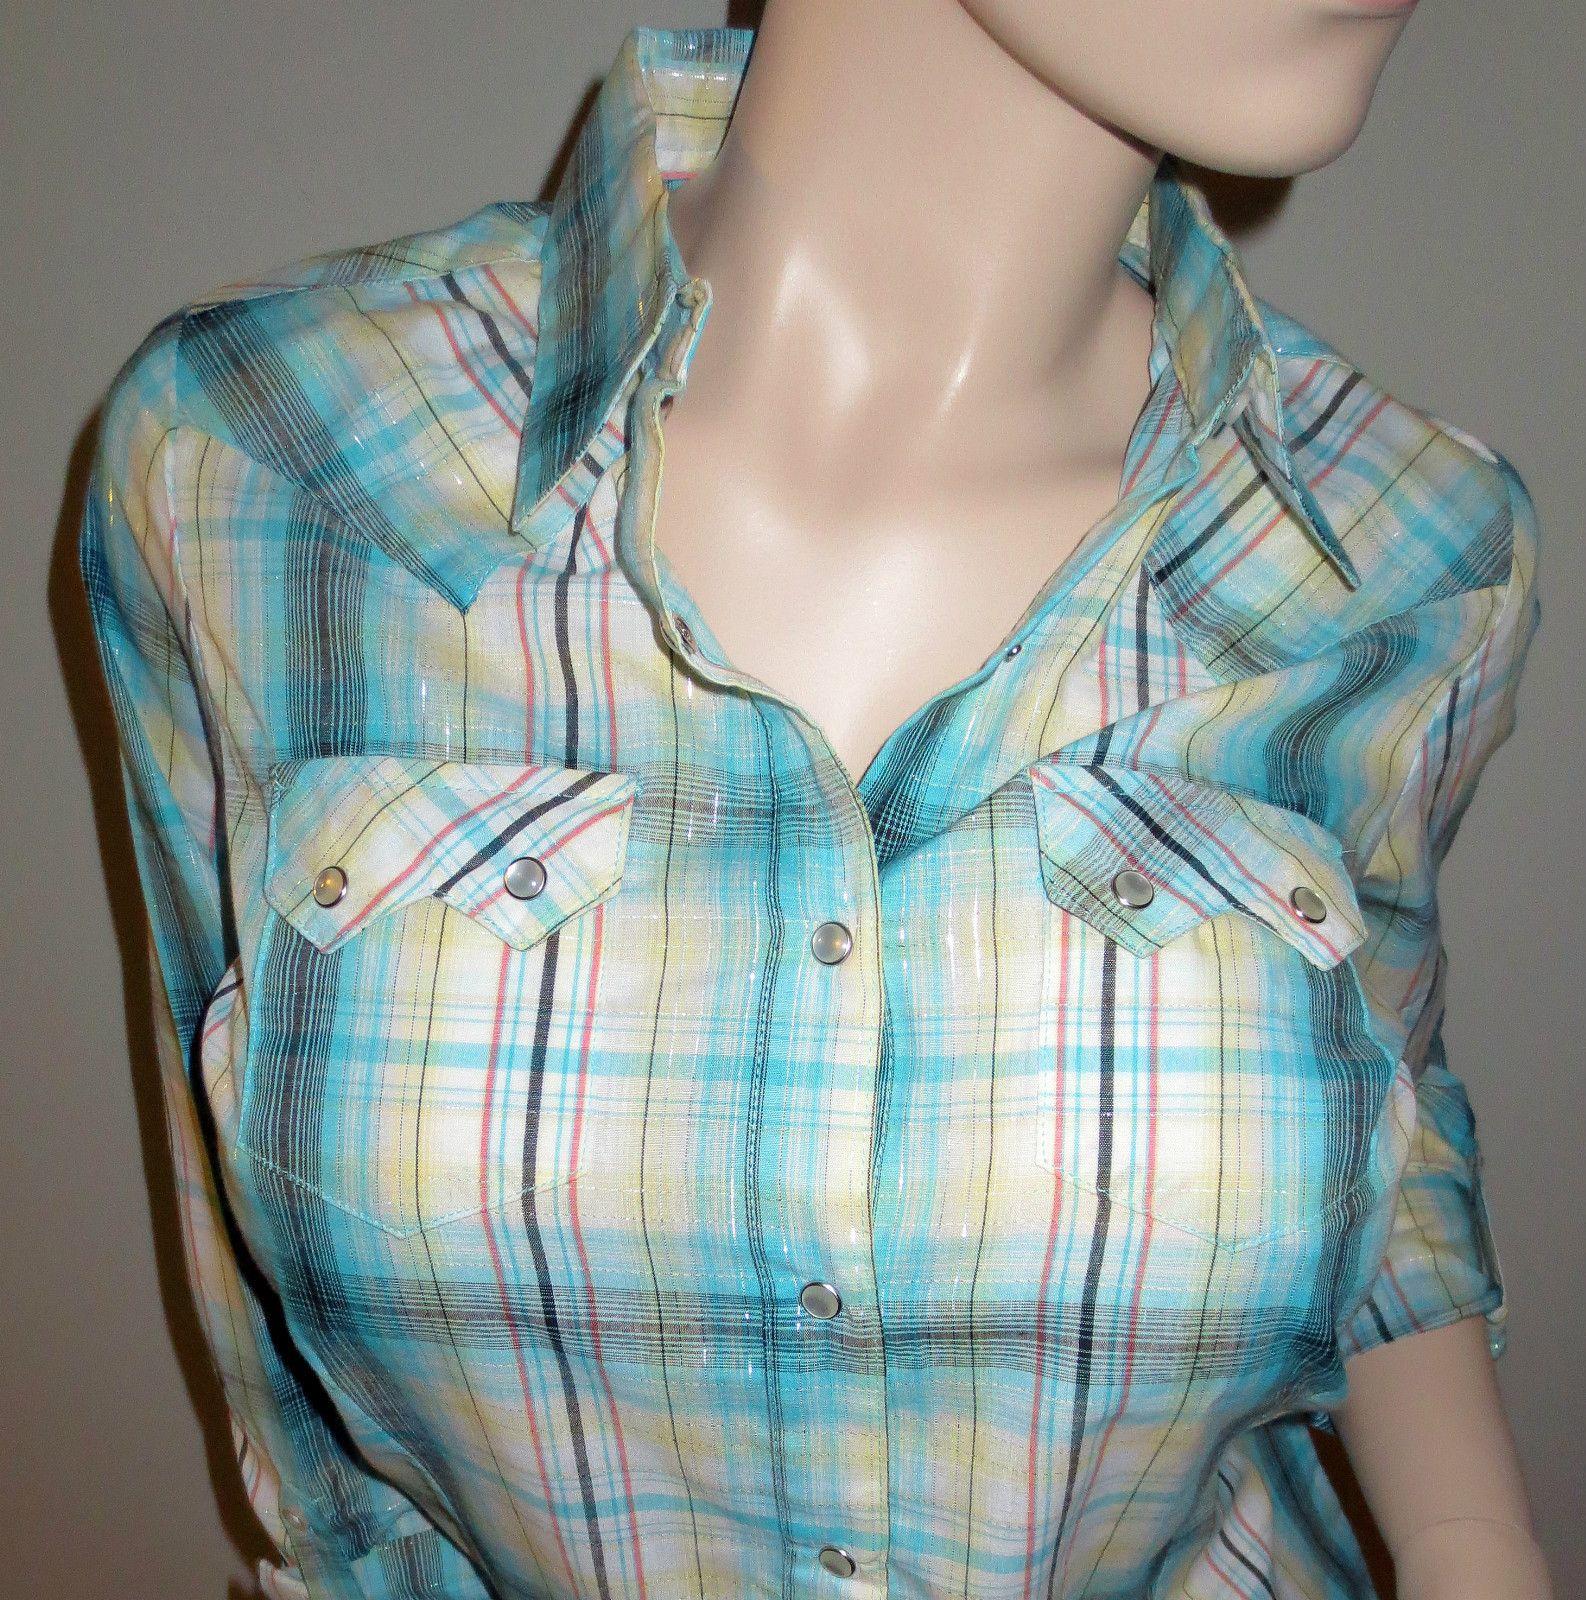 Wrancher by Wrangler Western Wear Long Sleeve Blue Plaid Shirt Medium New ~ CALLING ALL COWGIRLS ~ On Sale